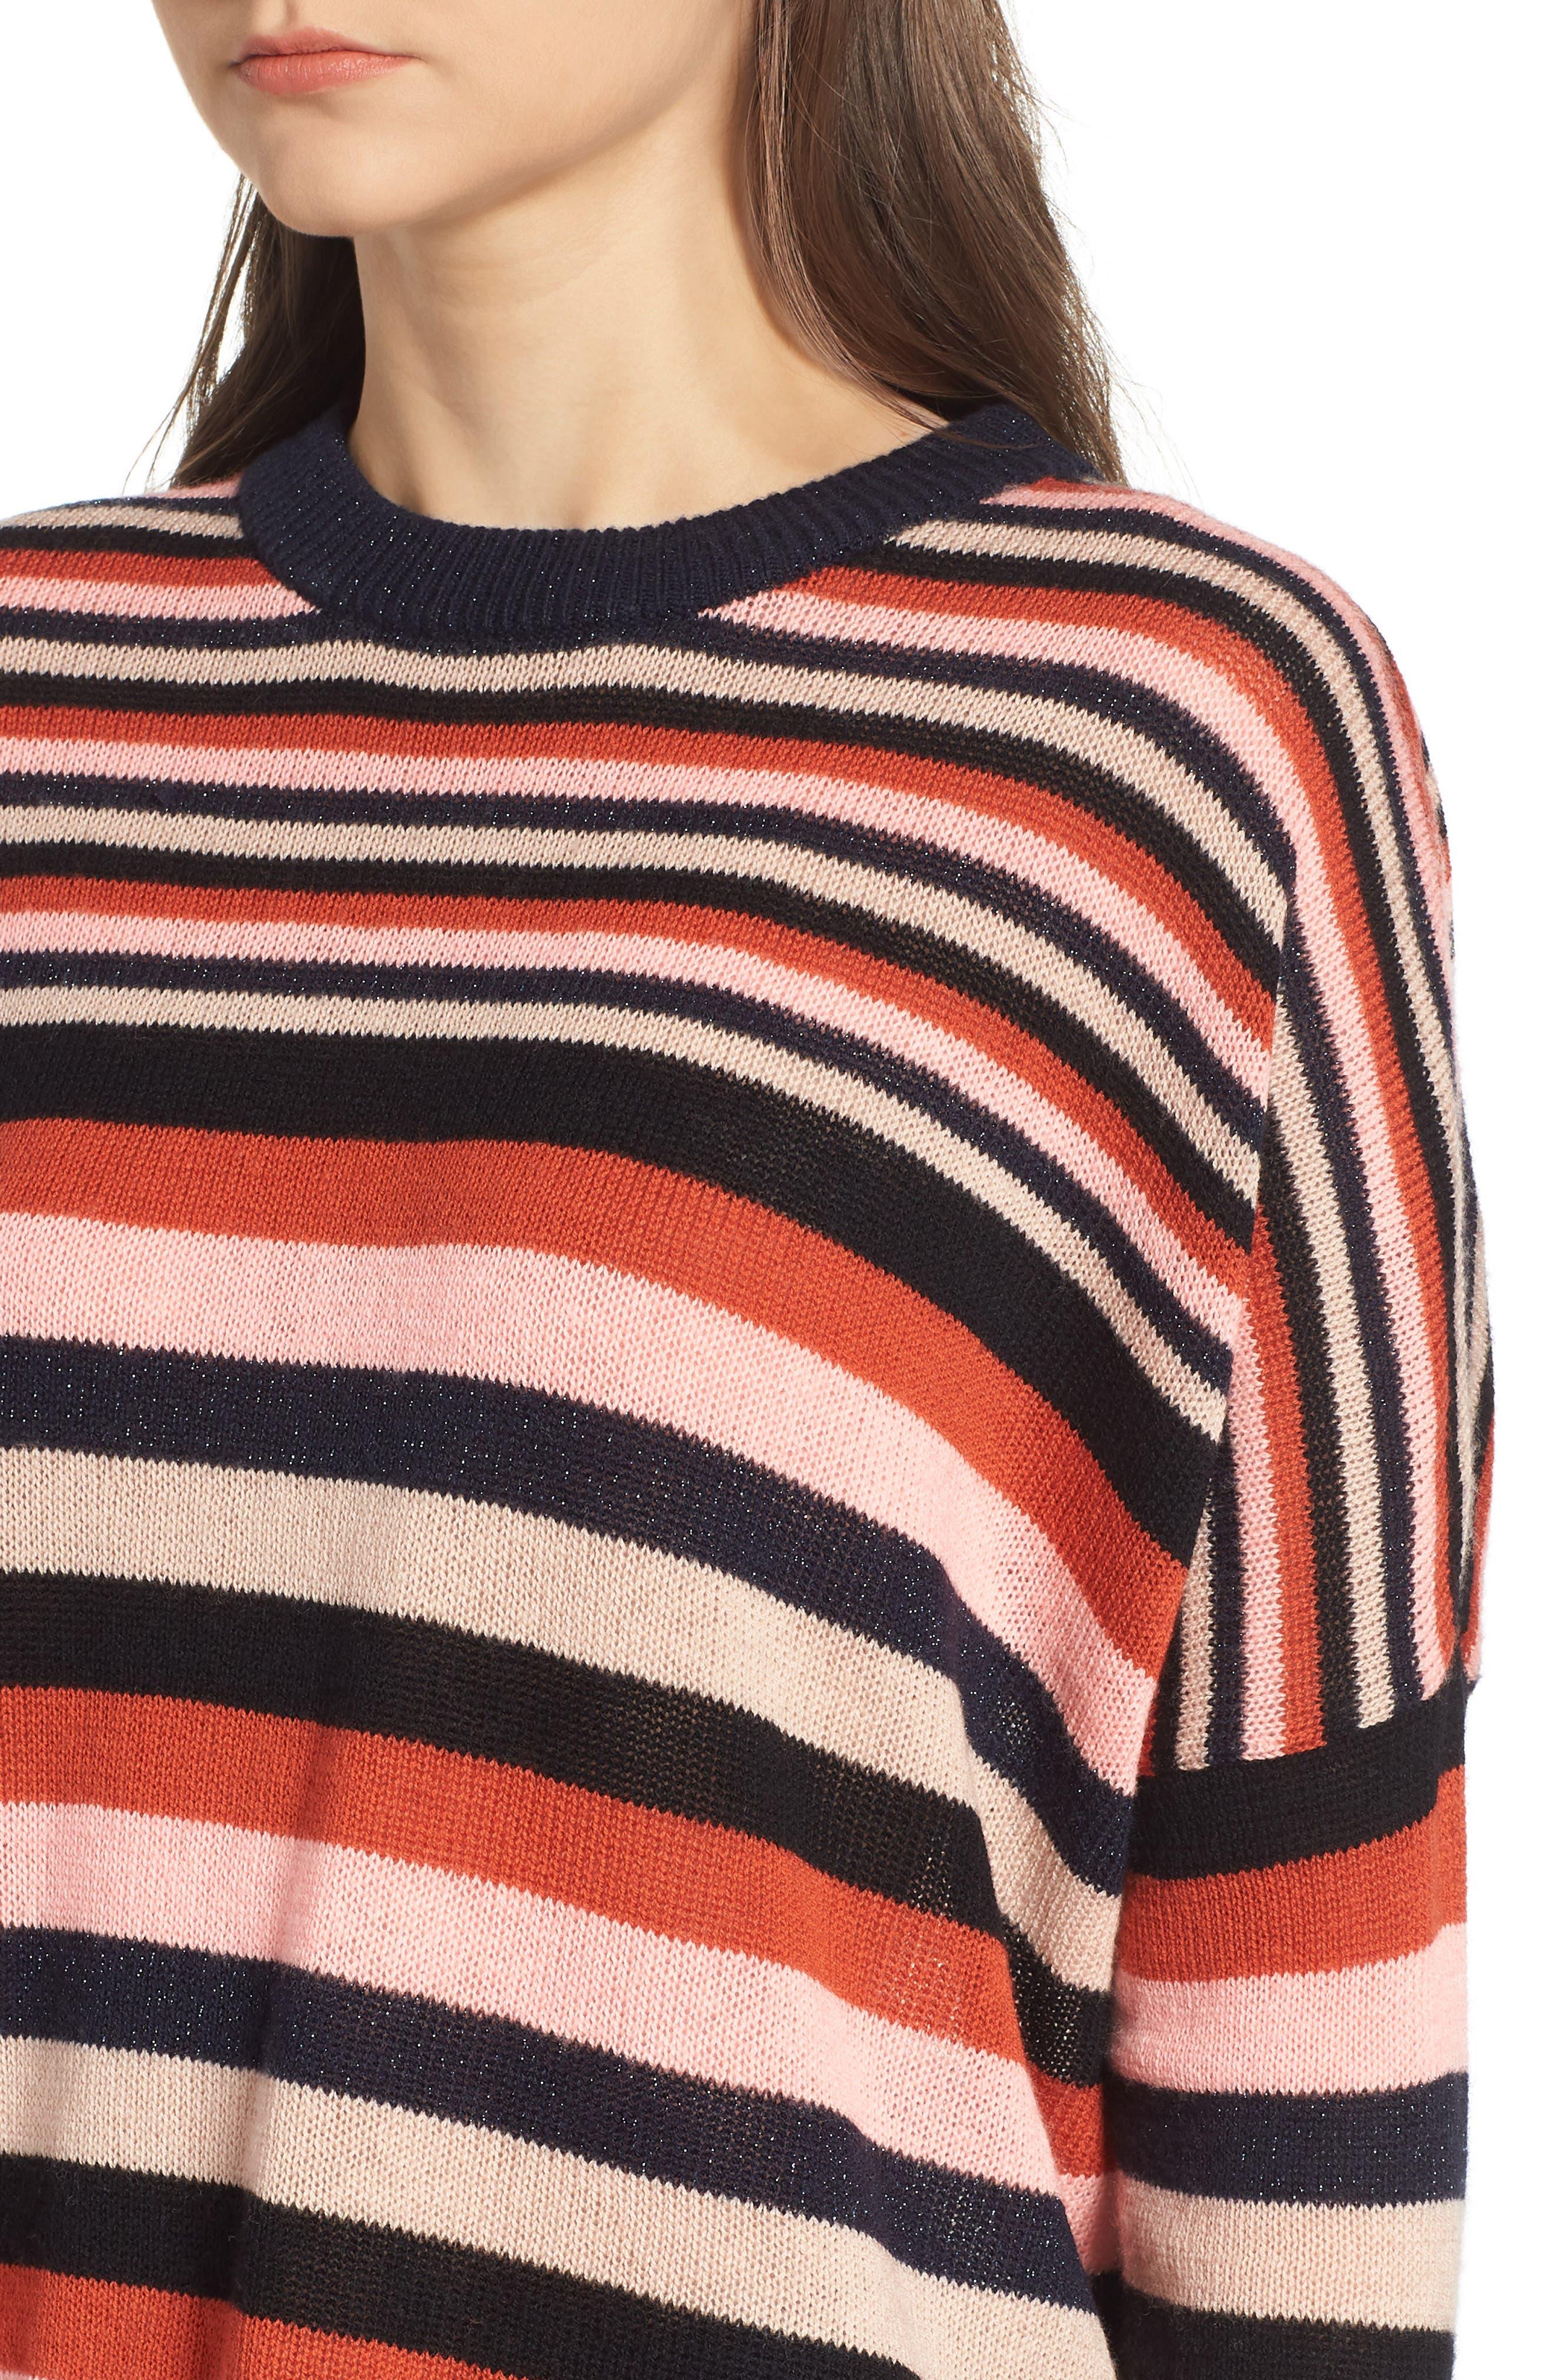 SCOTCH & SODA,                             Stripe Sweater,                             Alternate thumbnail 4, color,                             651